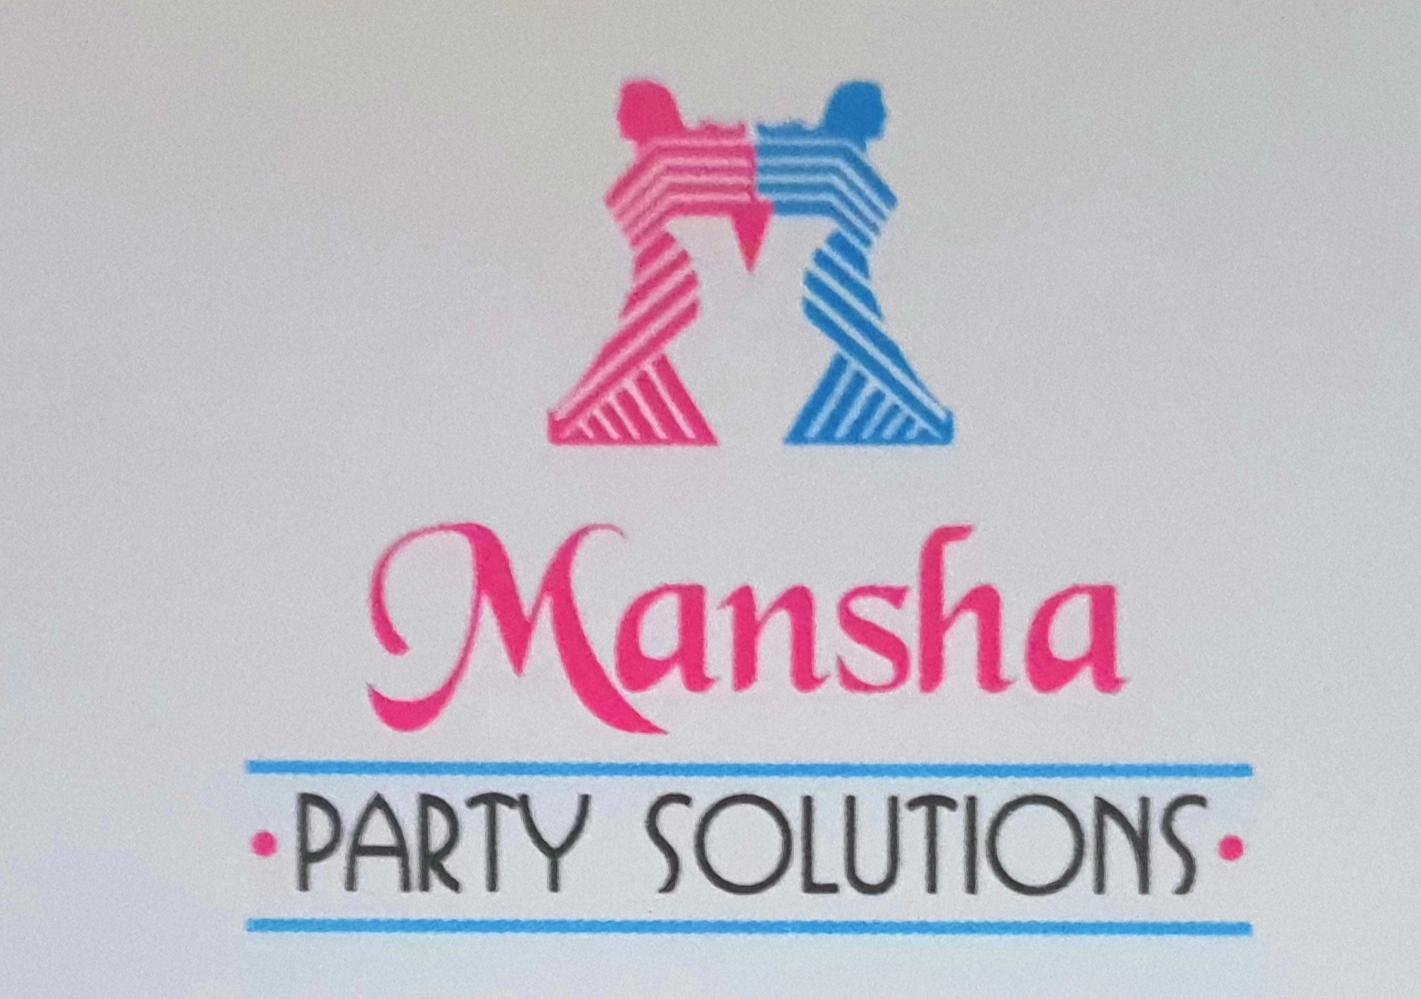 MANSHA PARTY SOLUTION